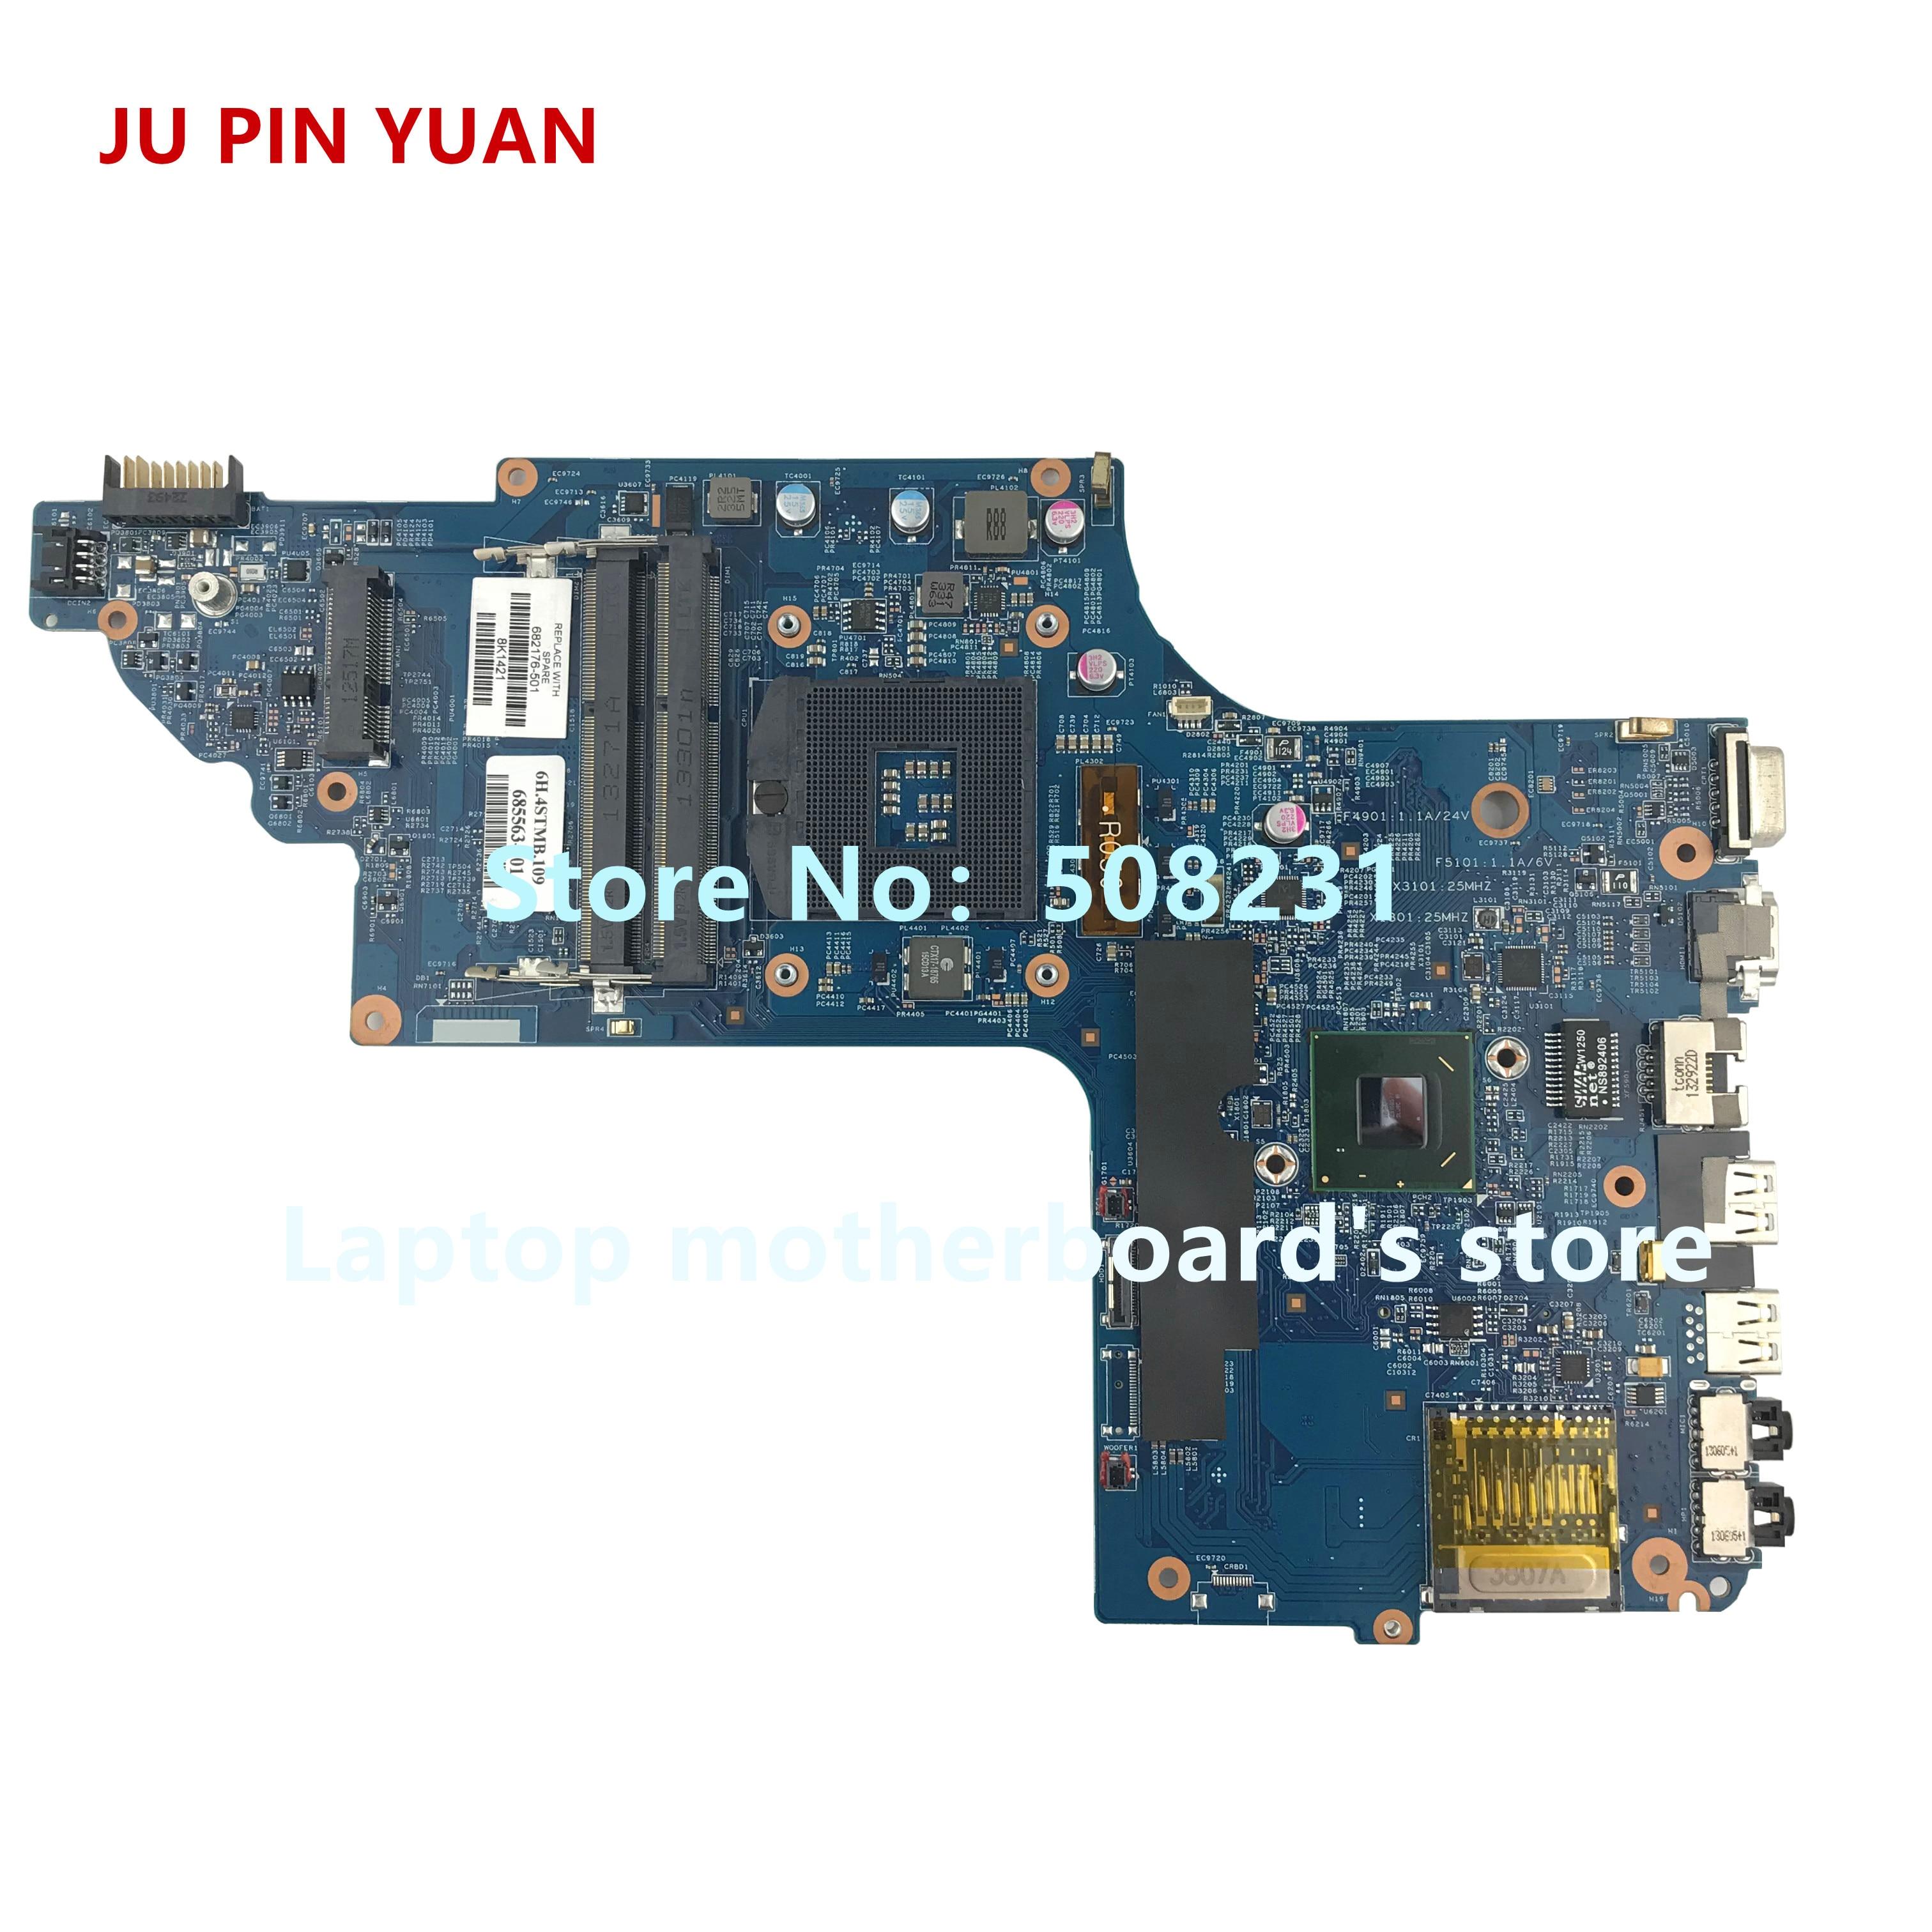 JU PIN YUAN 682176-501-682176 mainboard Para HP pavilion DV6 001 DV6-7000 DV6T-7000 Motherboard 48.4ST04.021 HM77, totalmente Testado